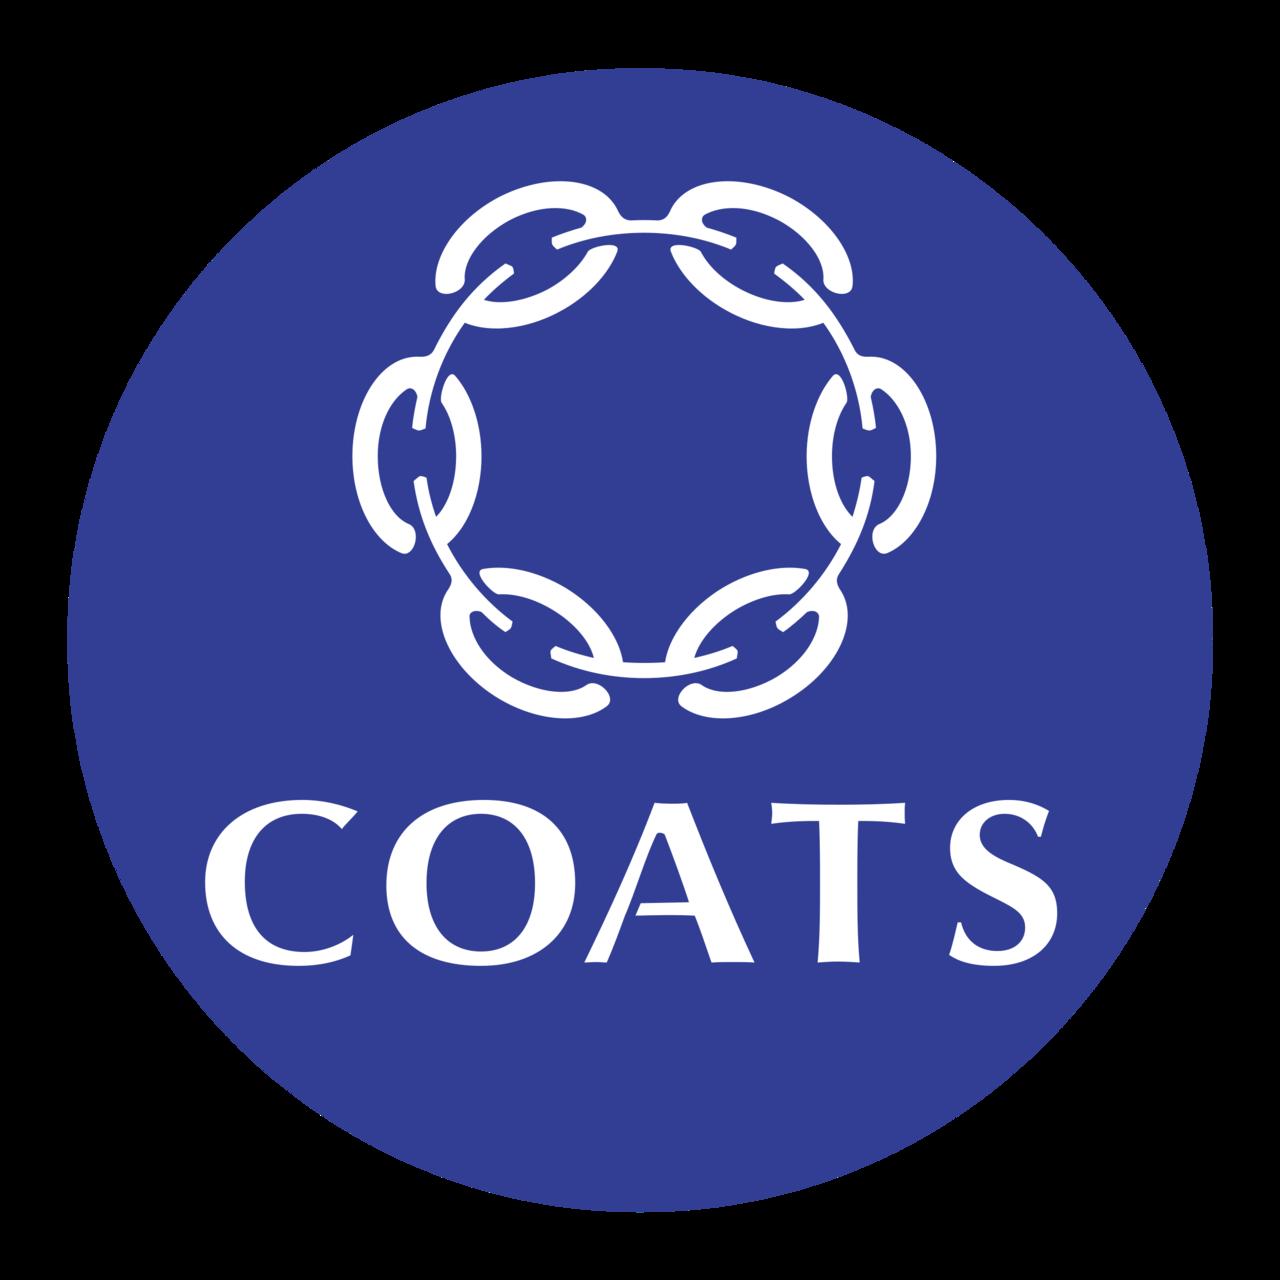 coats-logo